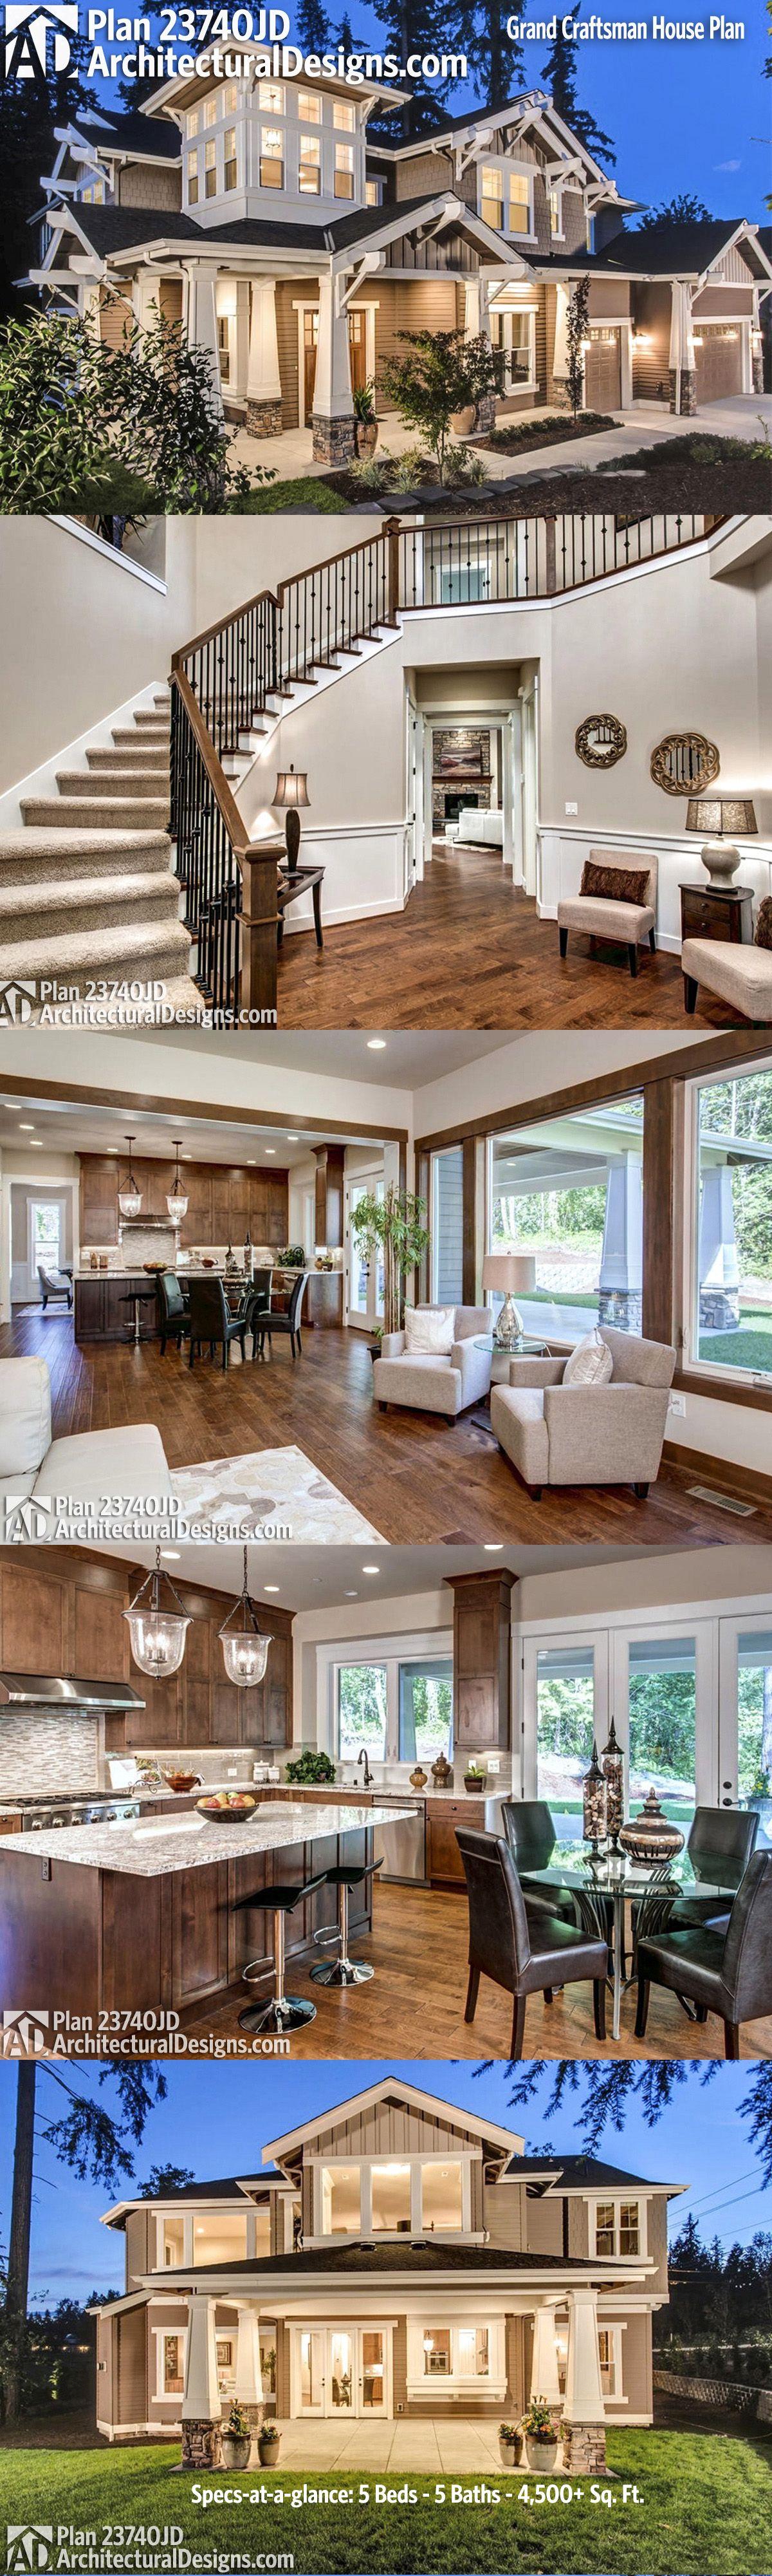 c07b0de34813aabb4570c93cd285d305 Top Result 52 Best Of Craftsman Style Home Plans Photography 2017 Hdj5